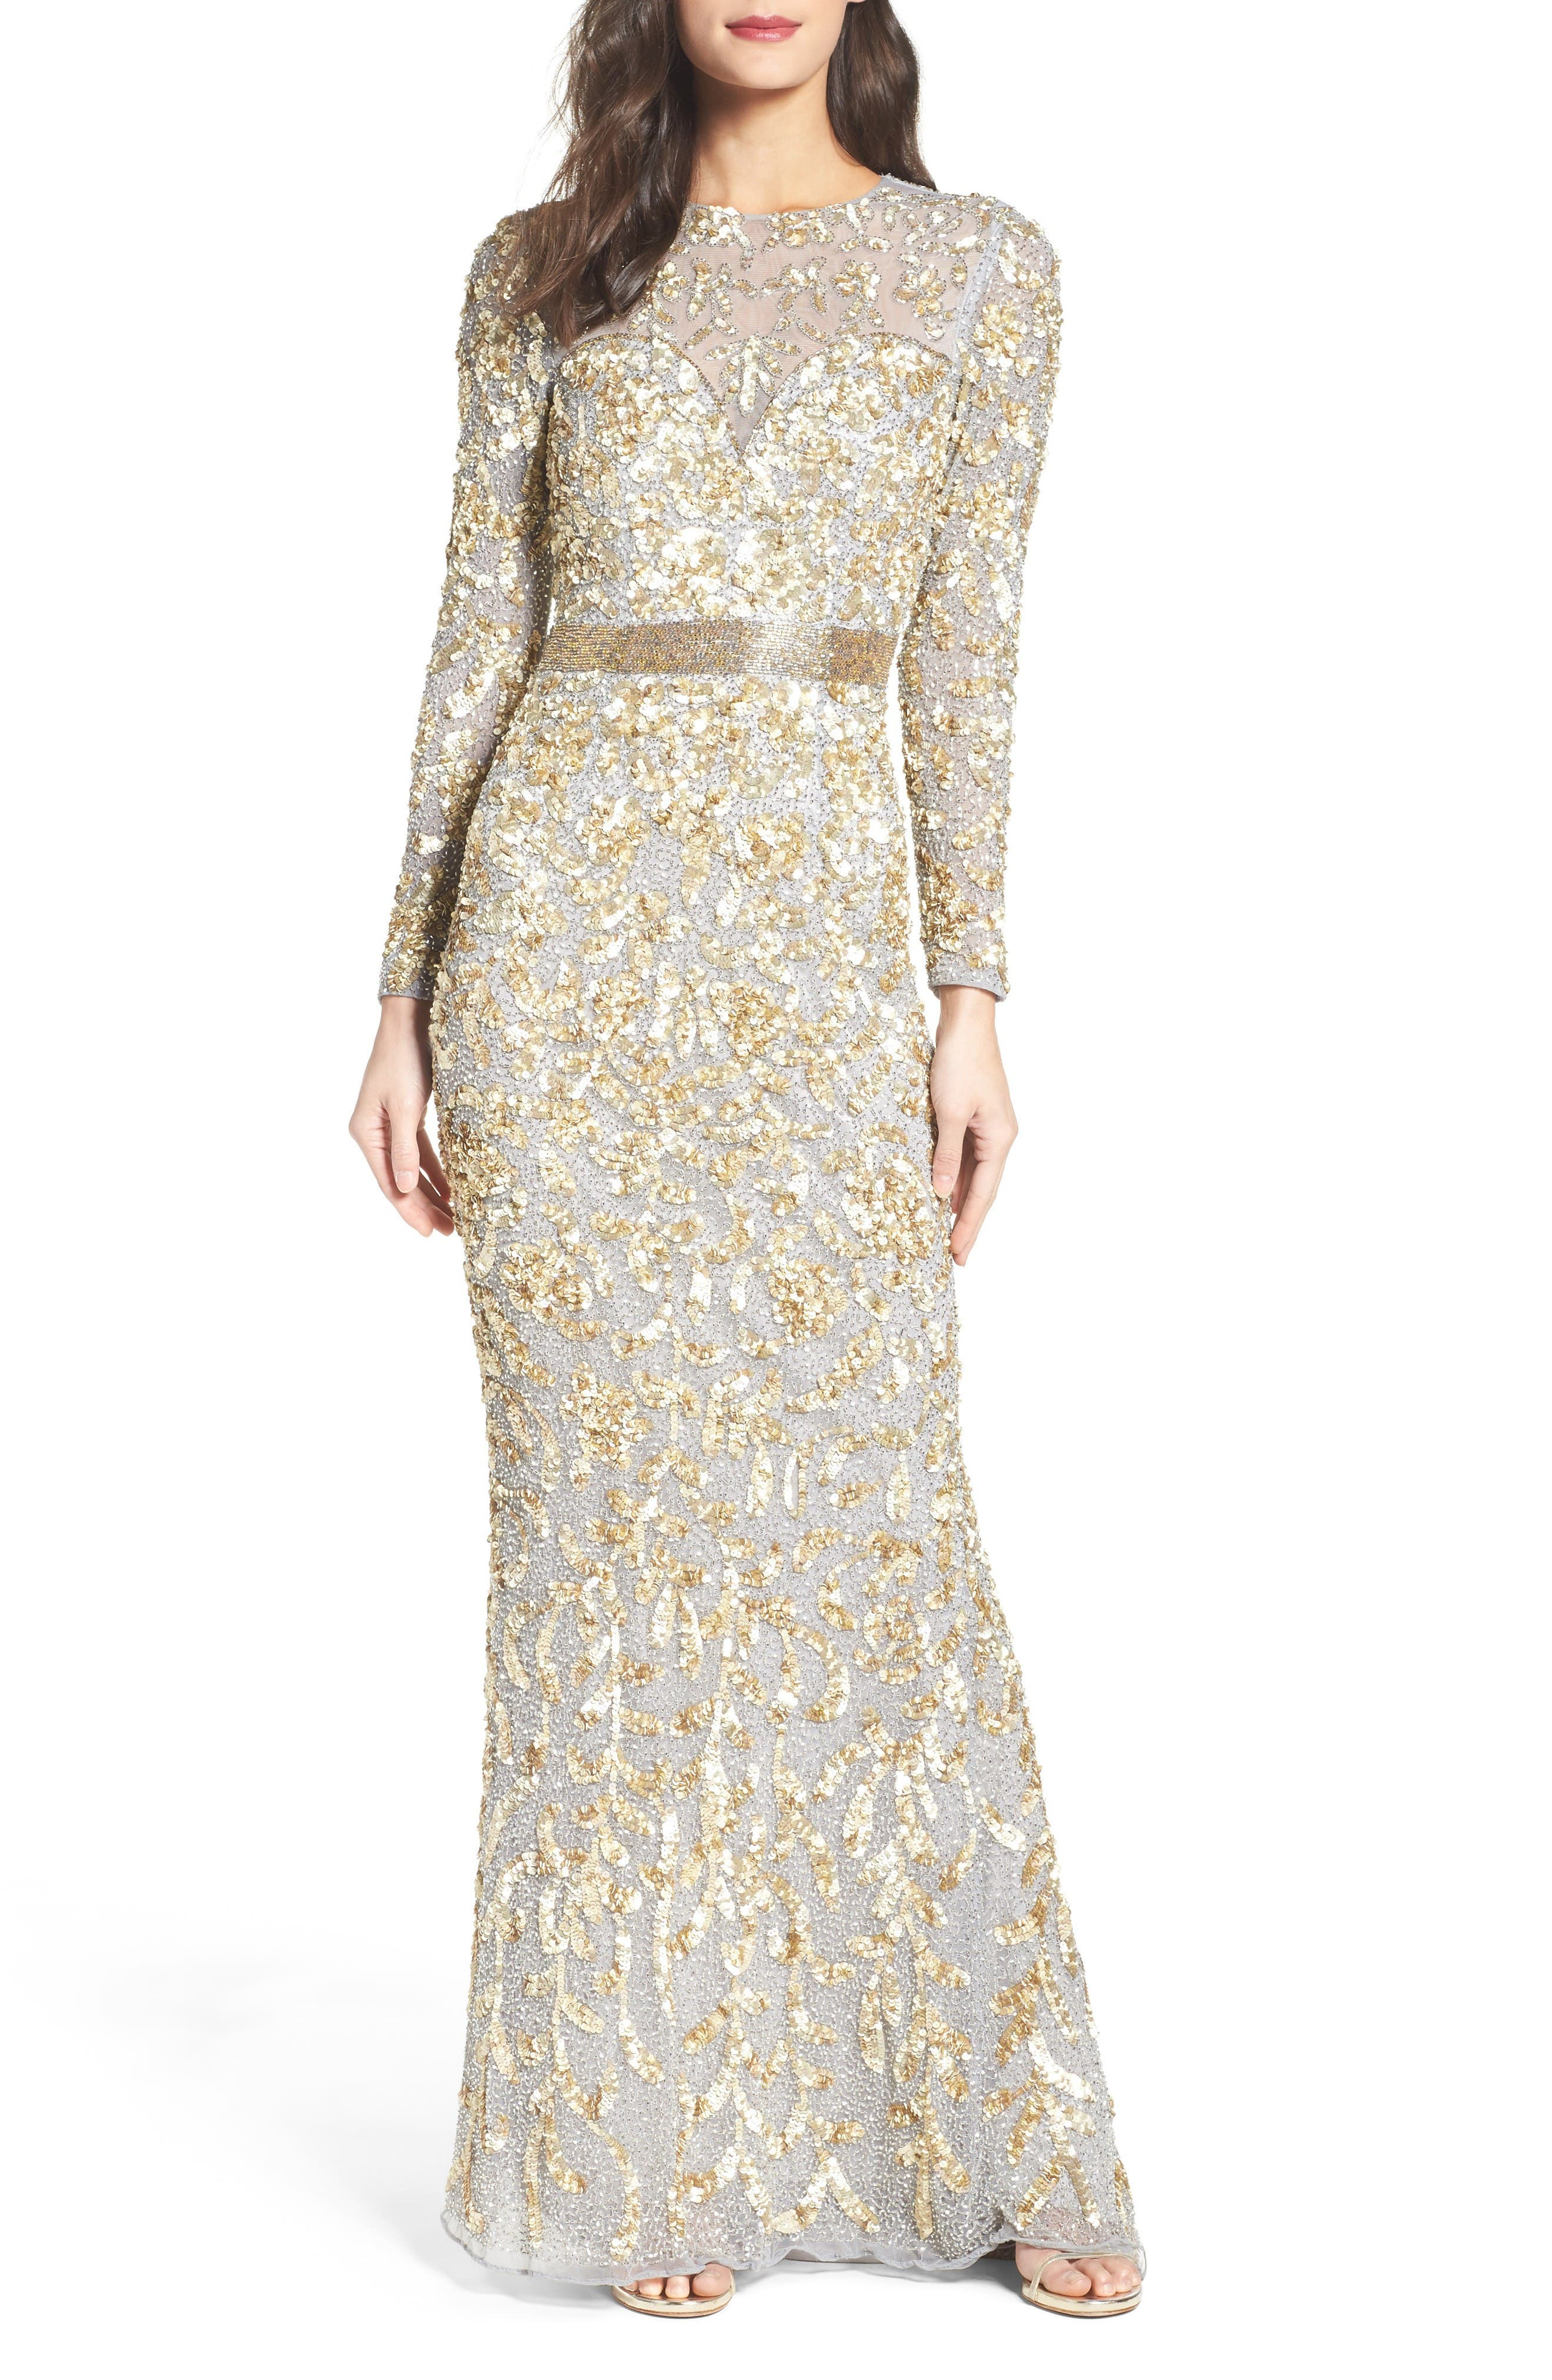 Michael h gold dresses quick